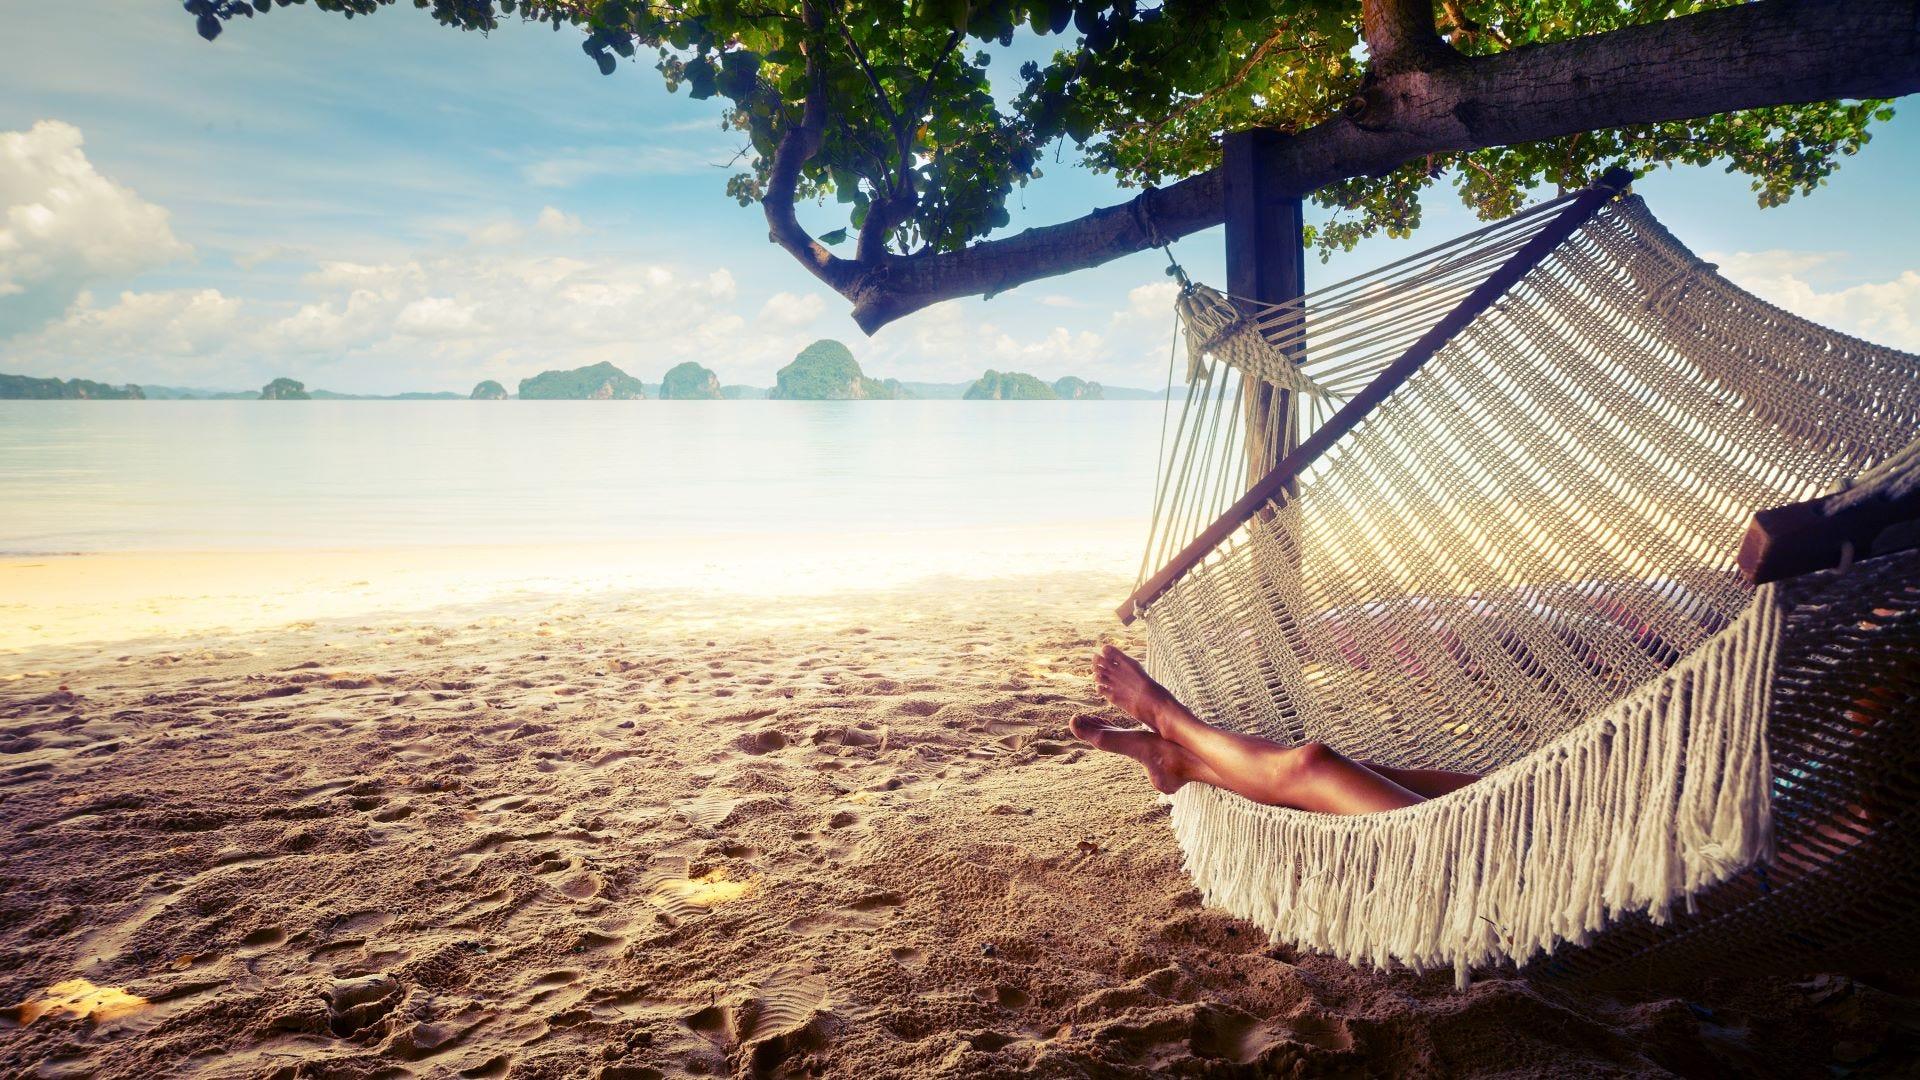 A woman lying in a hammock on the beach.